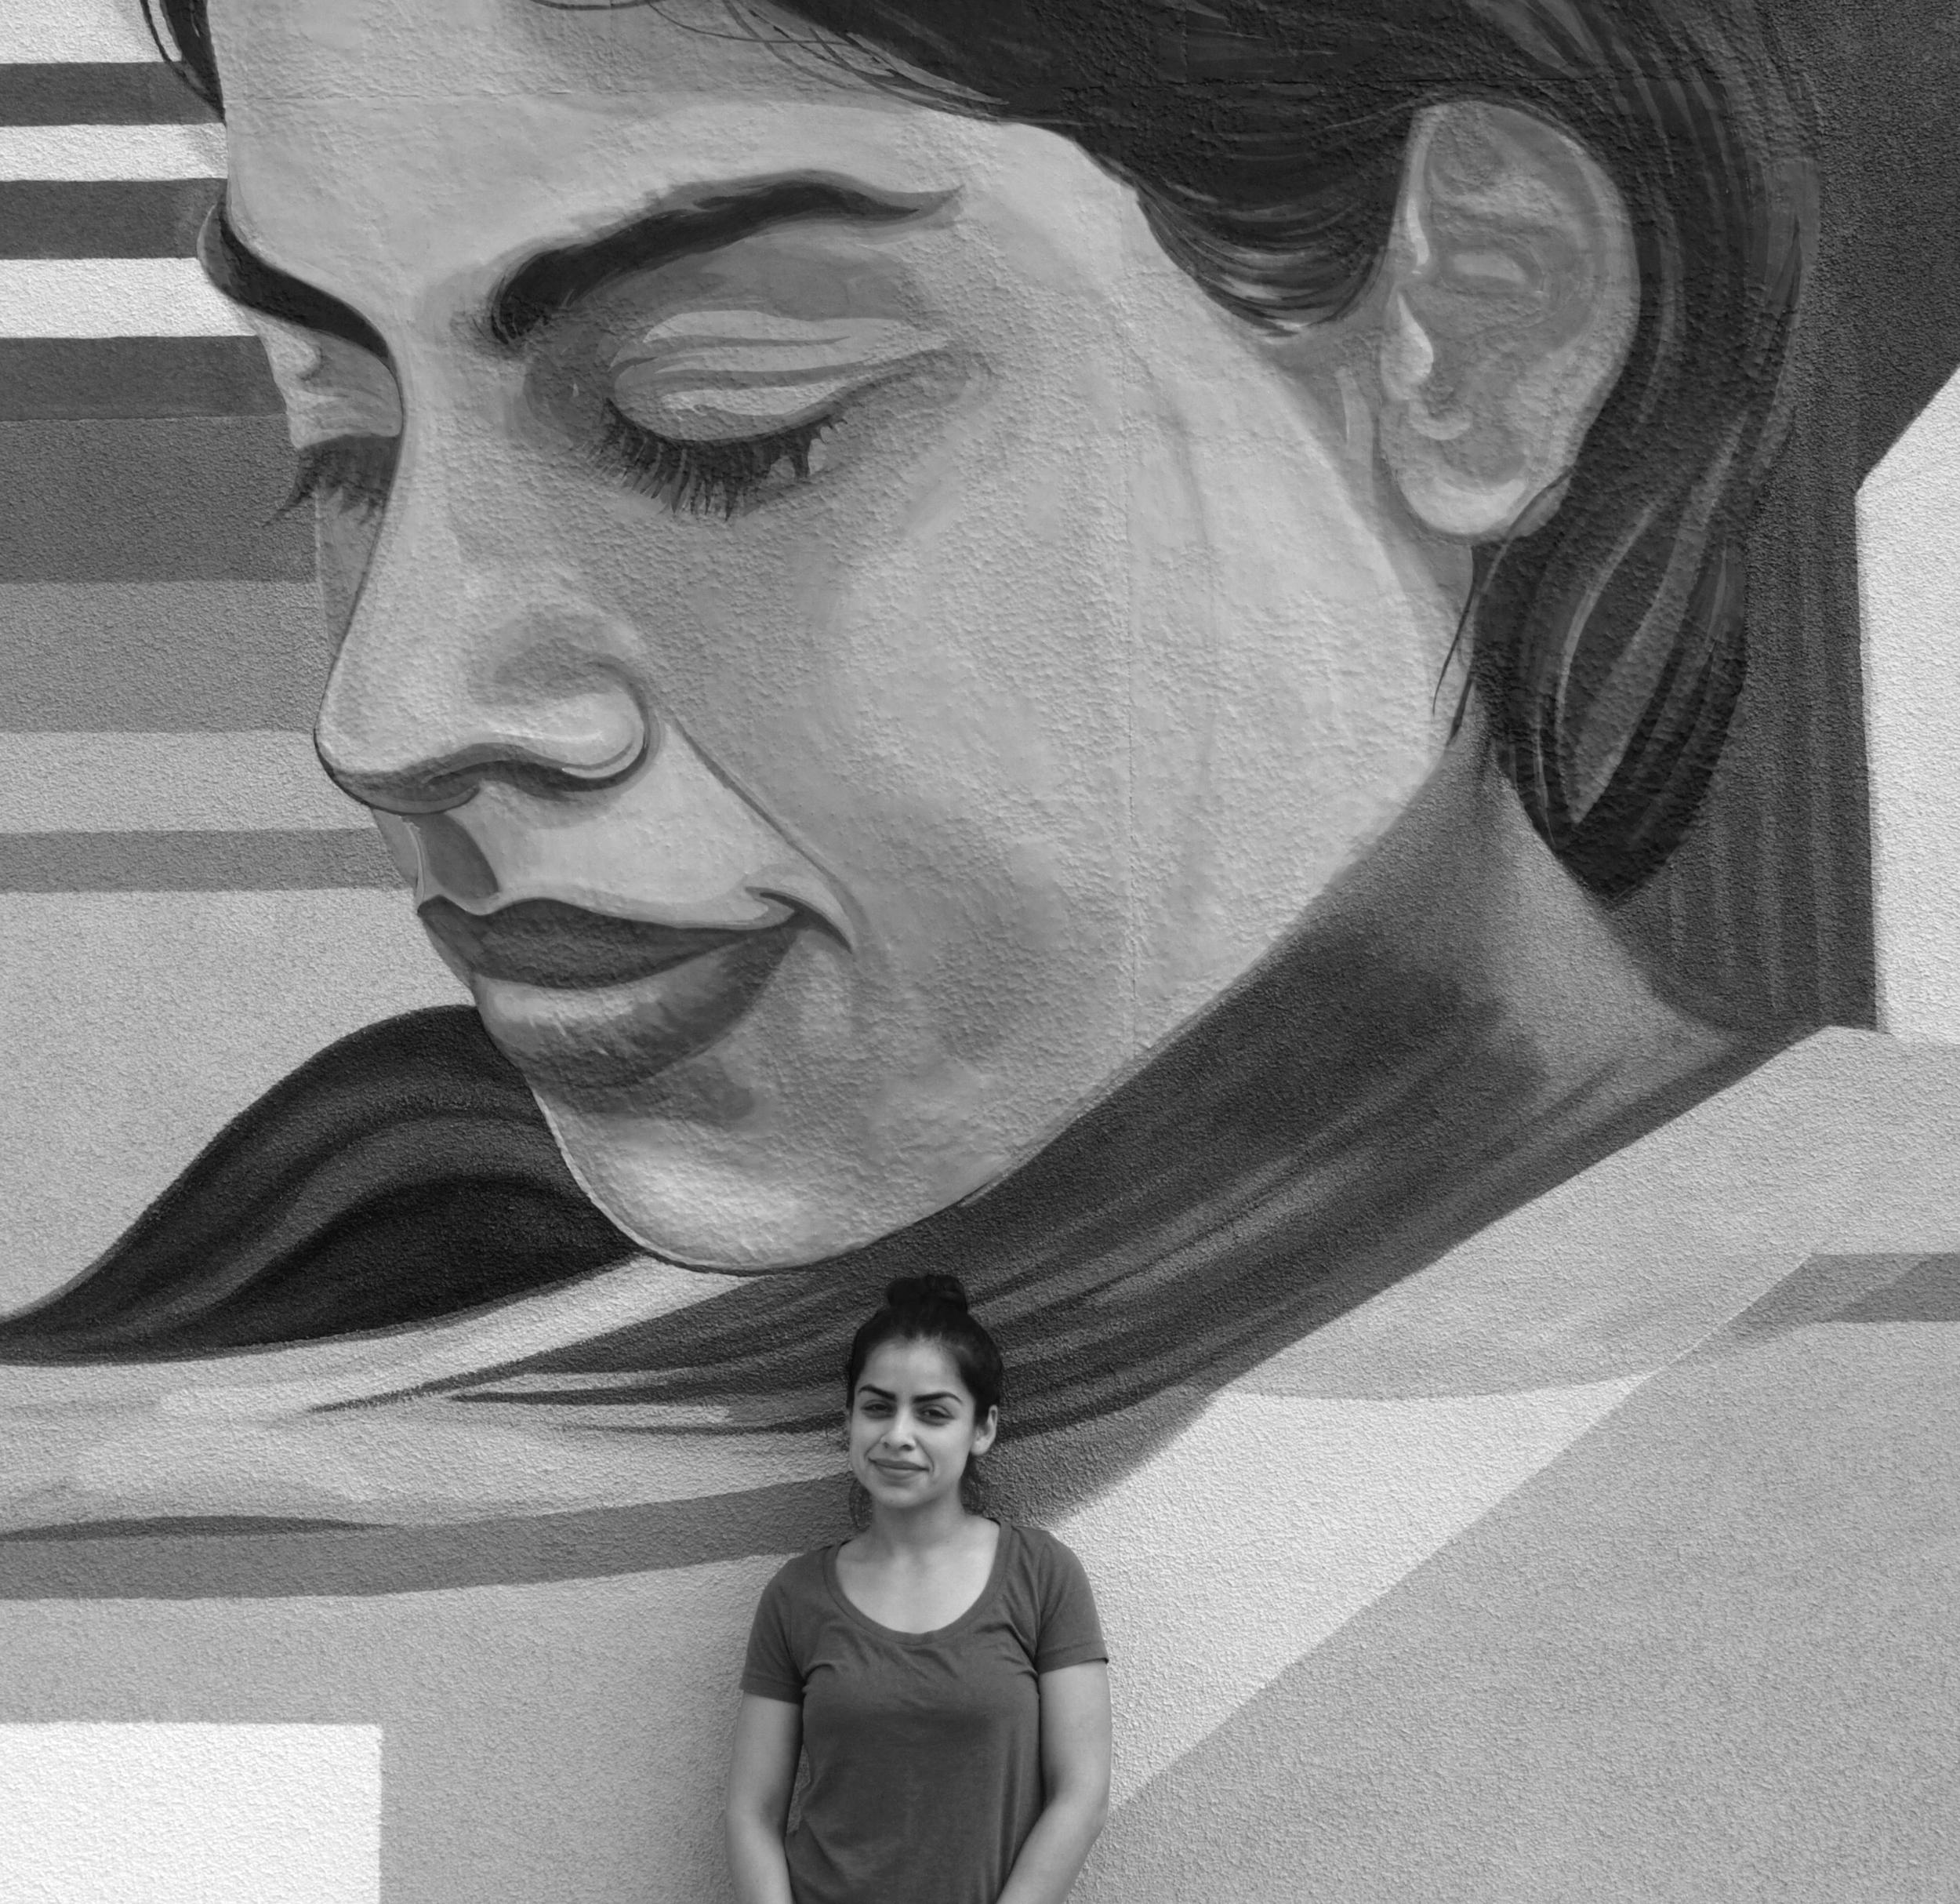 Model at the mural